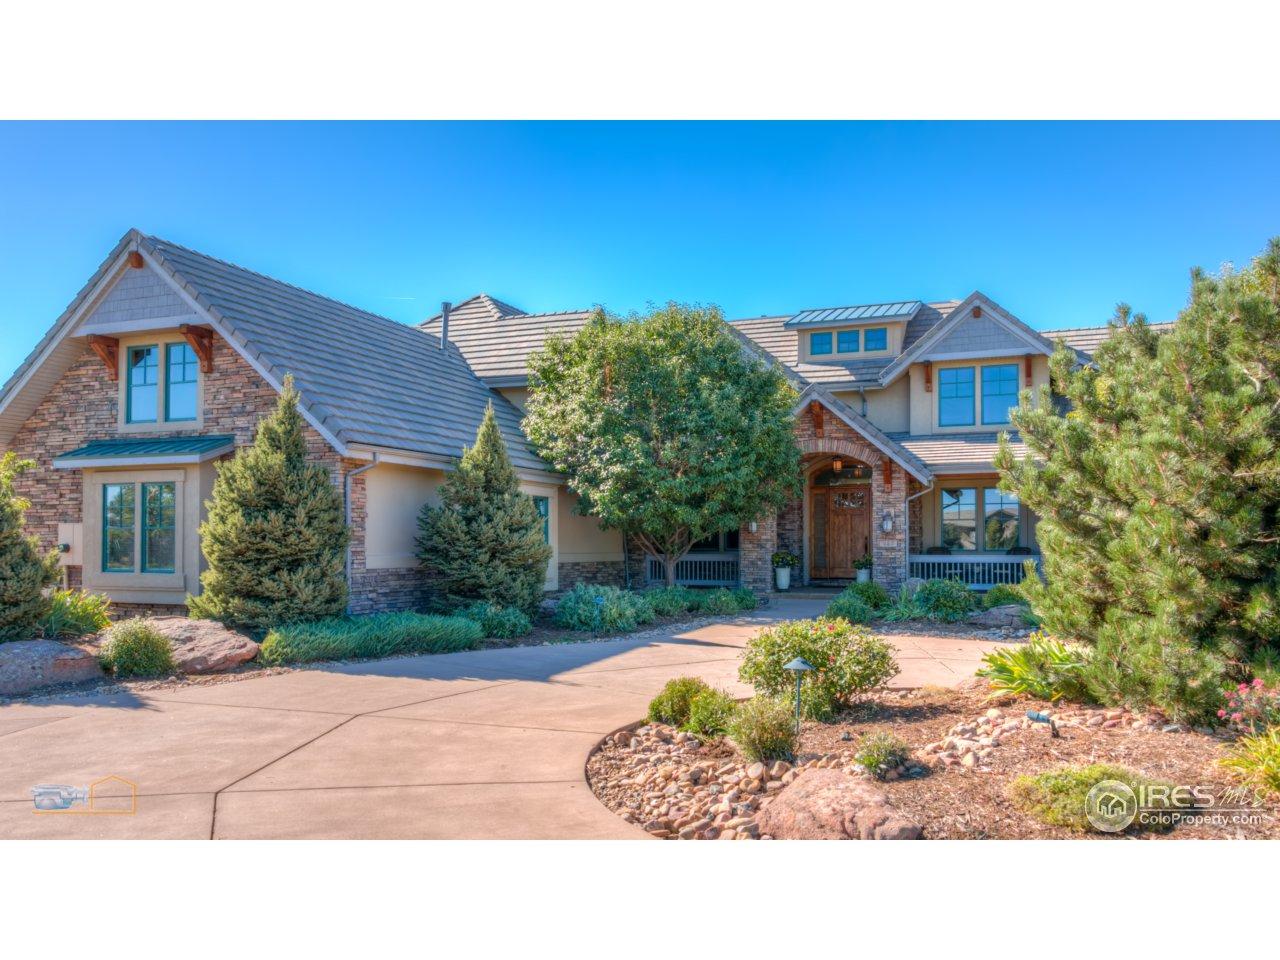 980 White Hawk Ranch Dr, Boulder CO 80303